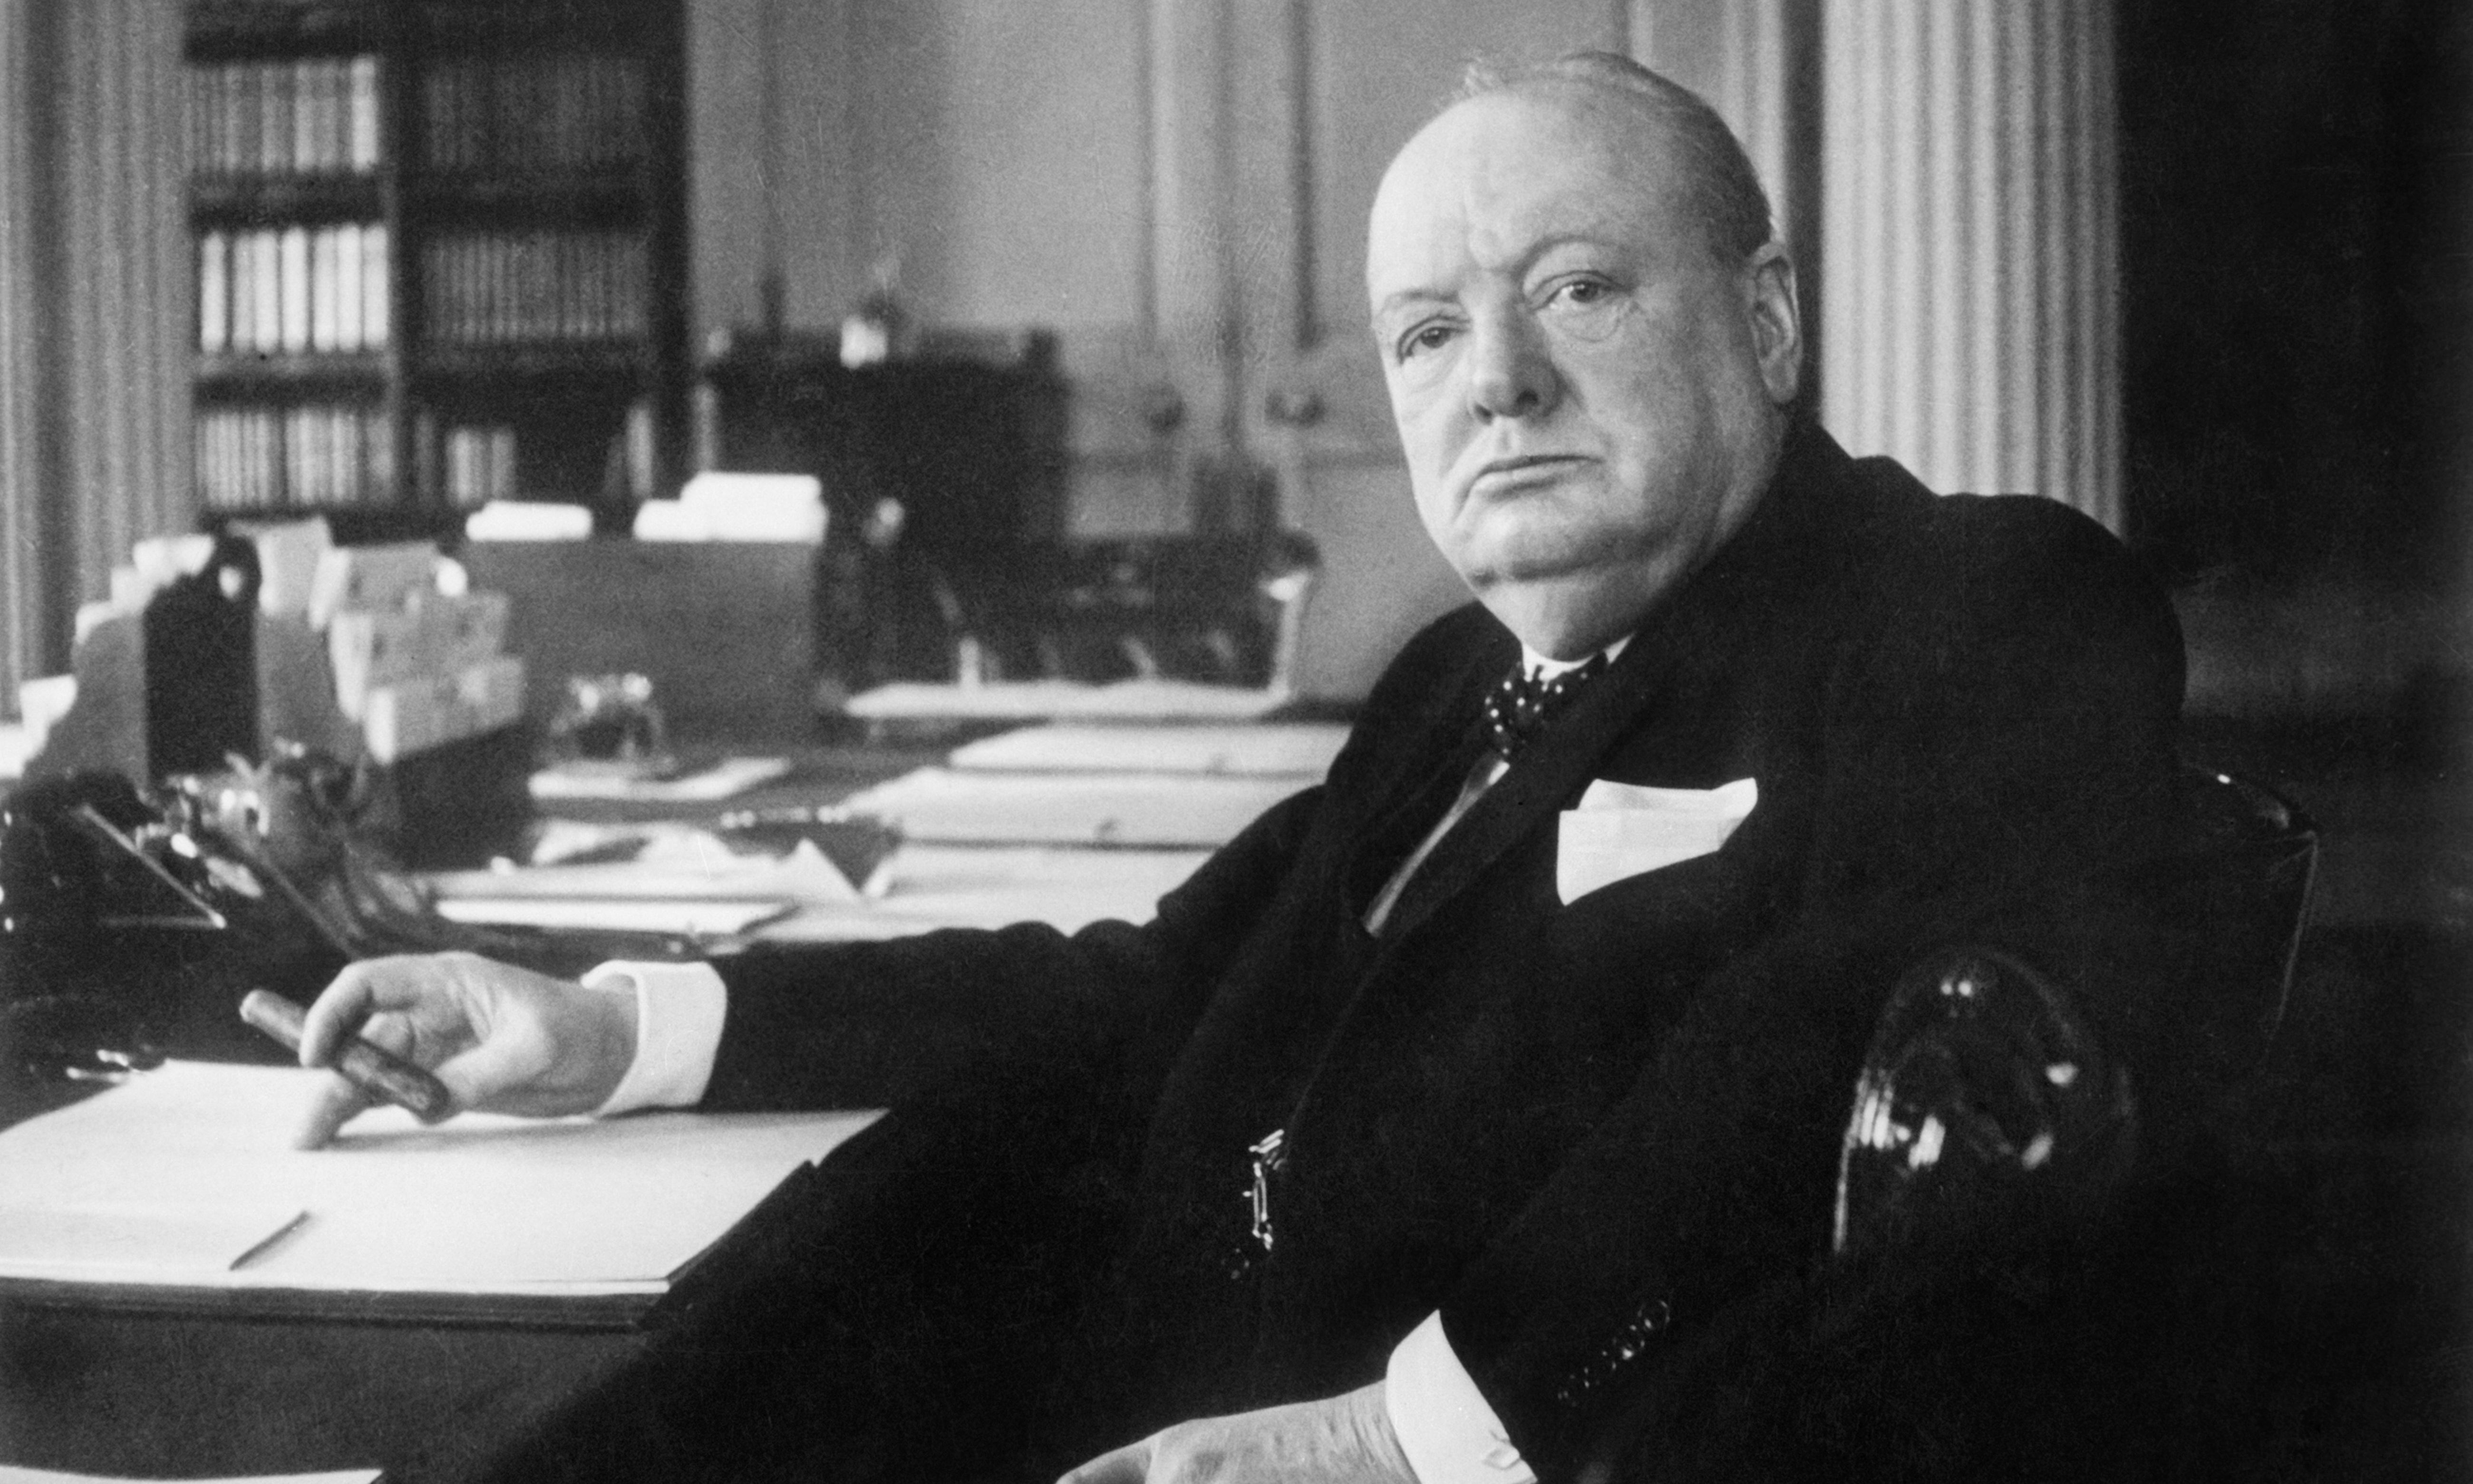 Winston Churchill 'shocked' by Downing Street restoration plan